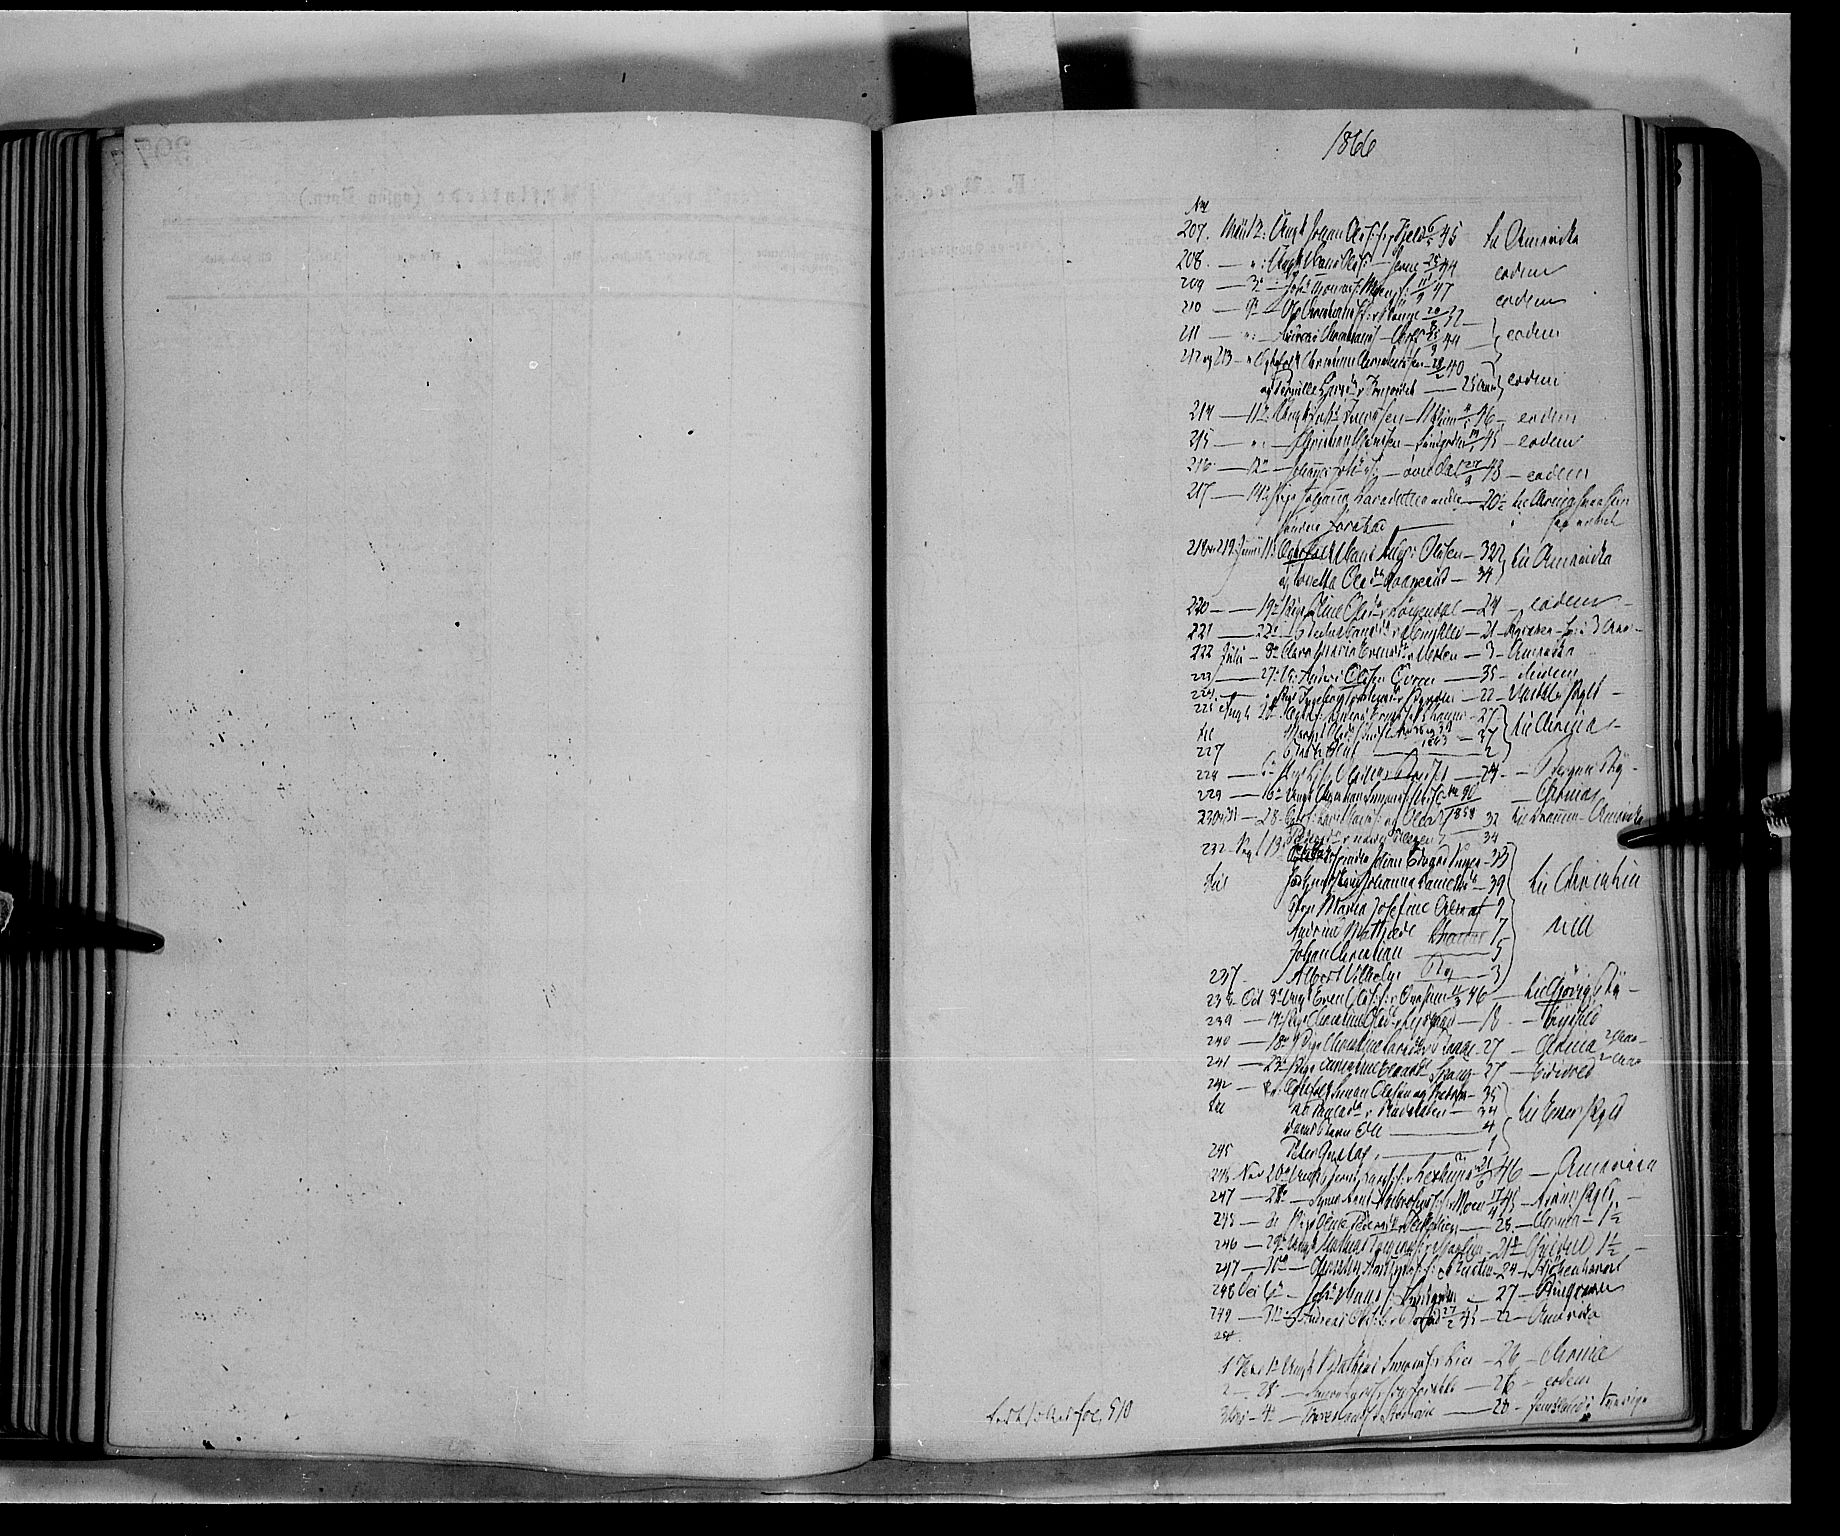 SAH, Fåberg prestekontor, Ministerialbok nr. 6B, 1855-1867, s. 397b